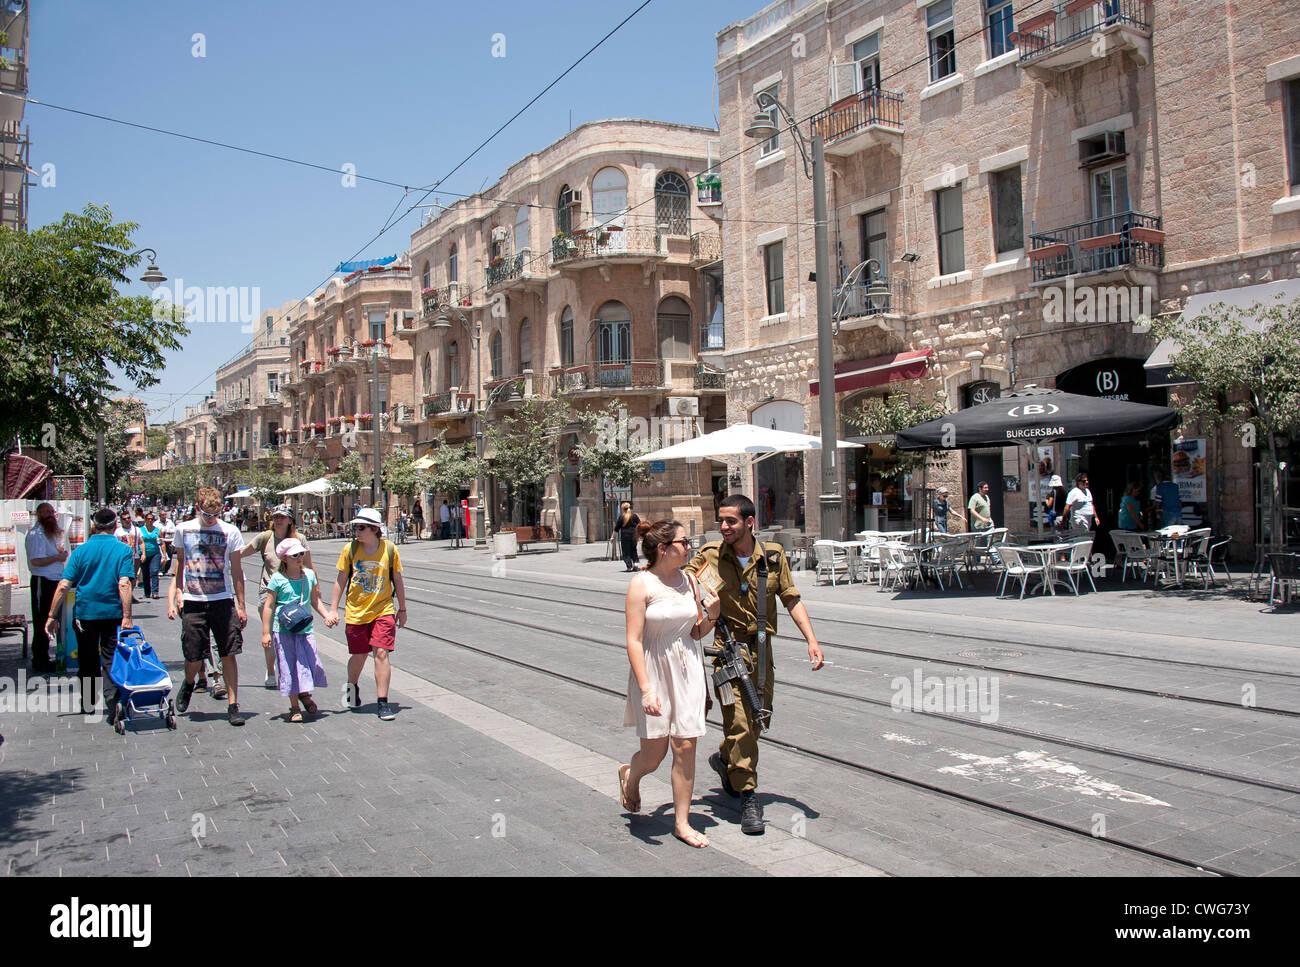 An Israeli soldier and a female walk down Jaffa Road, Jerusalem, Israel - Stock Image